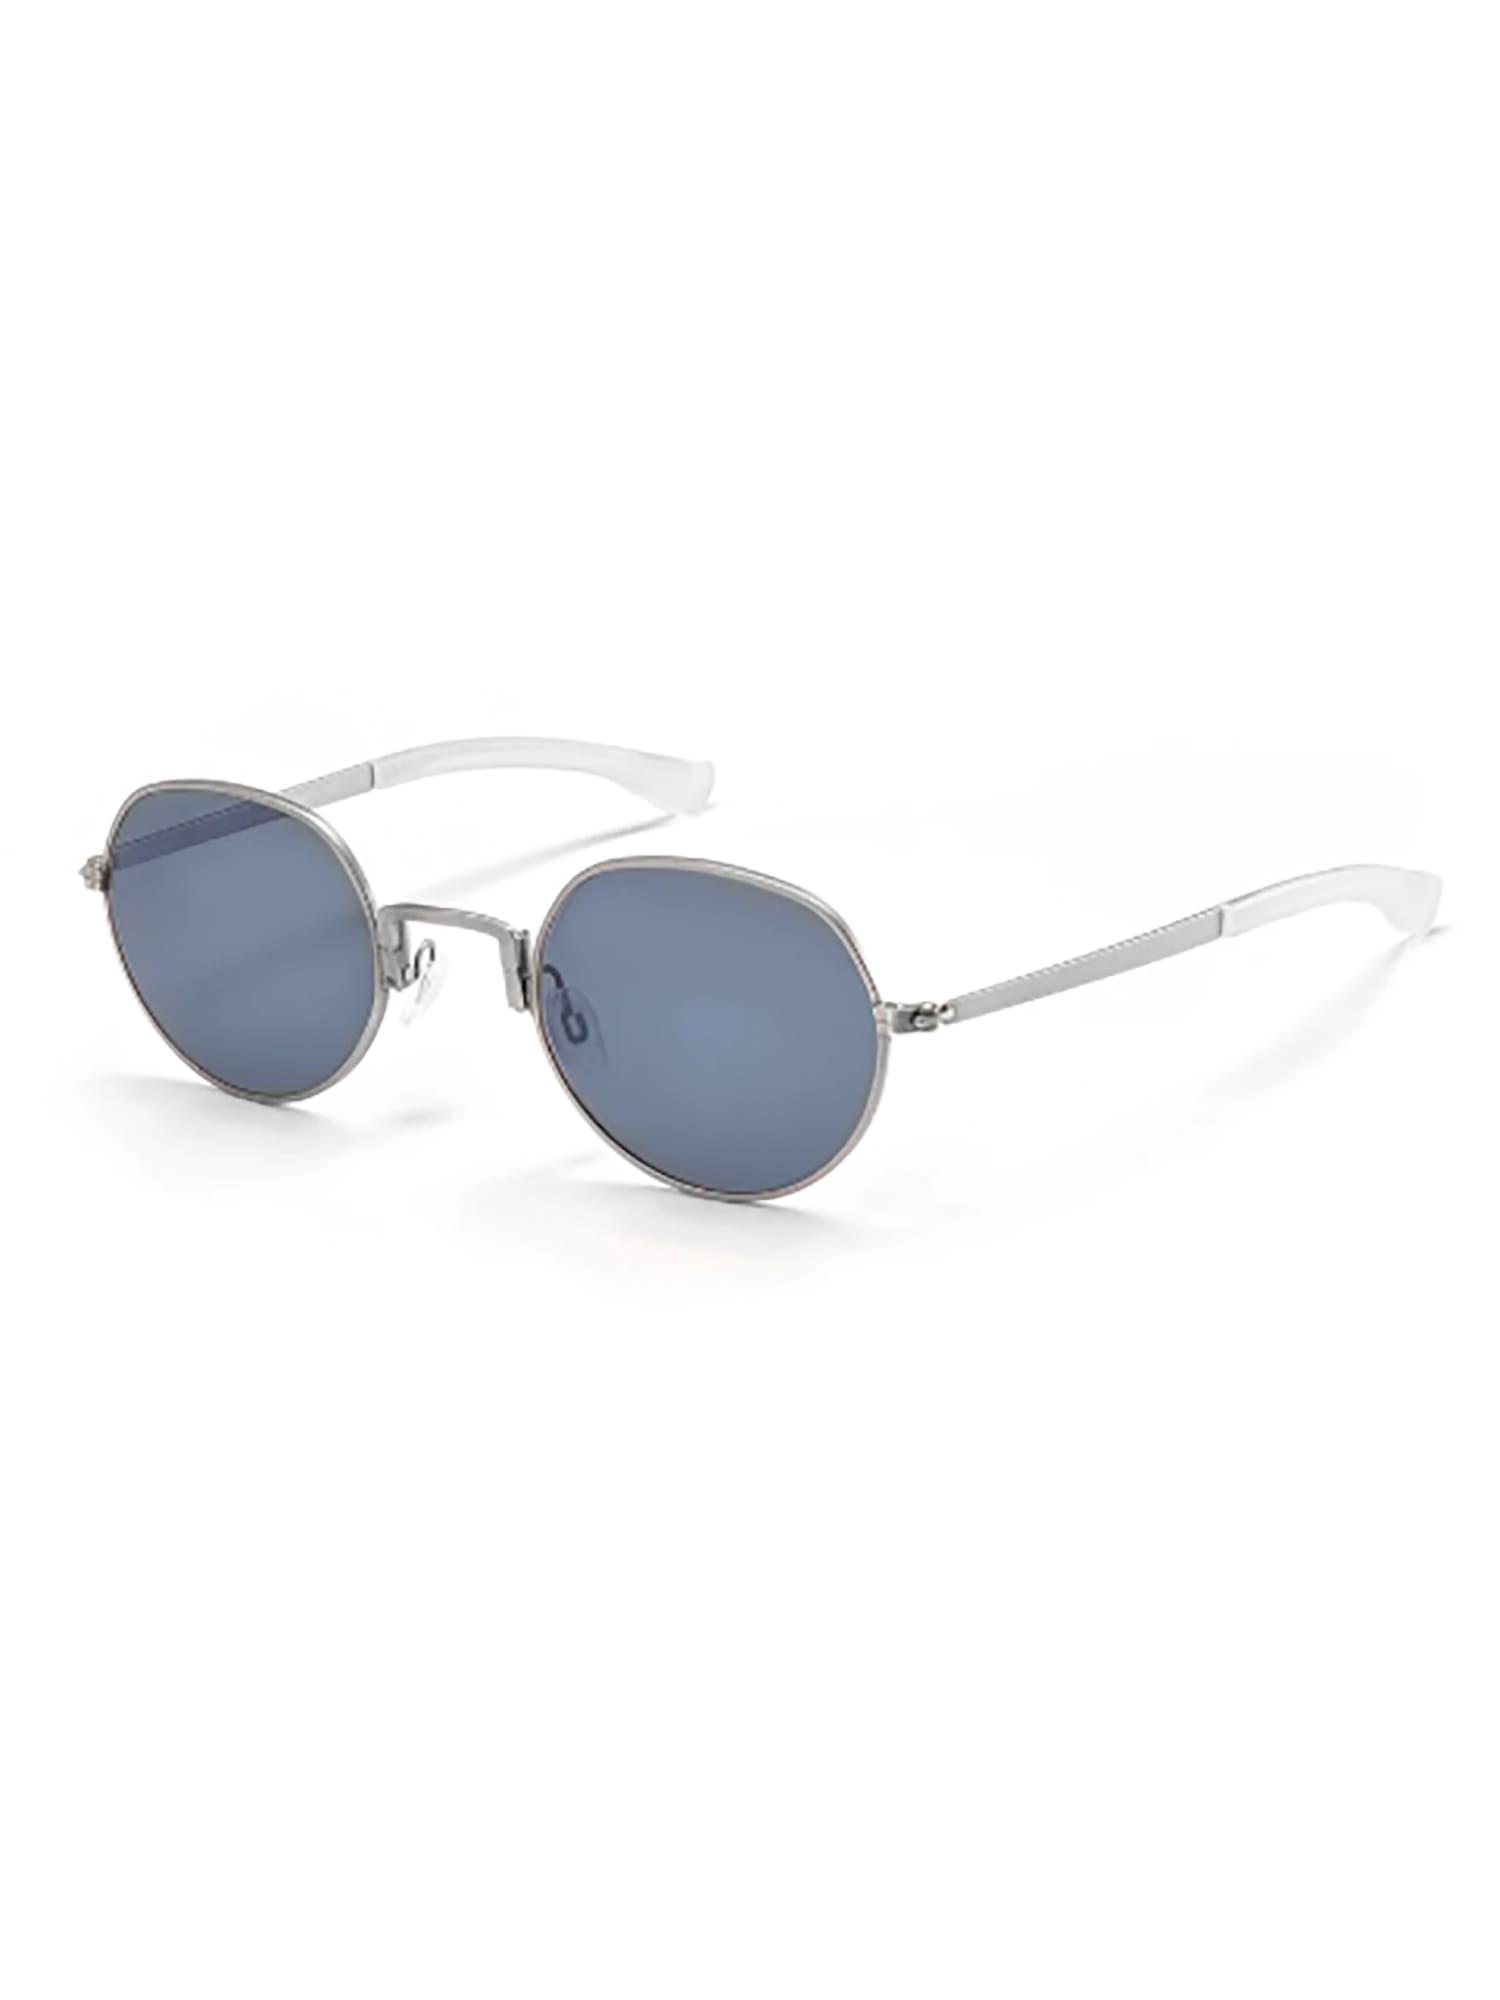 Movitra TYTUS TONDO SILVER Sunglasses